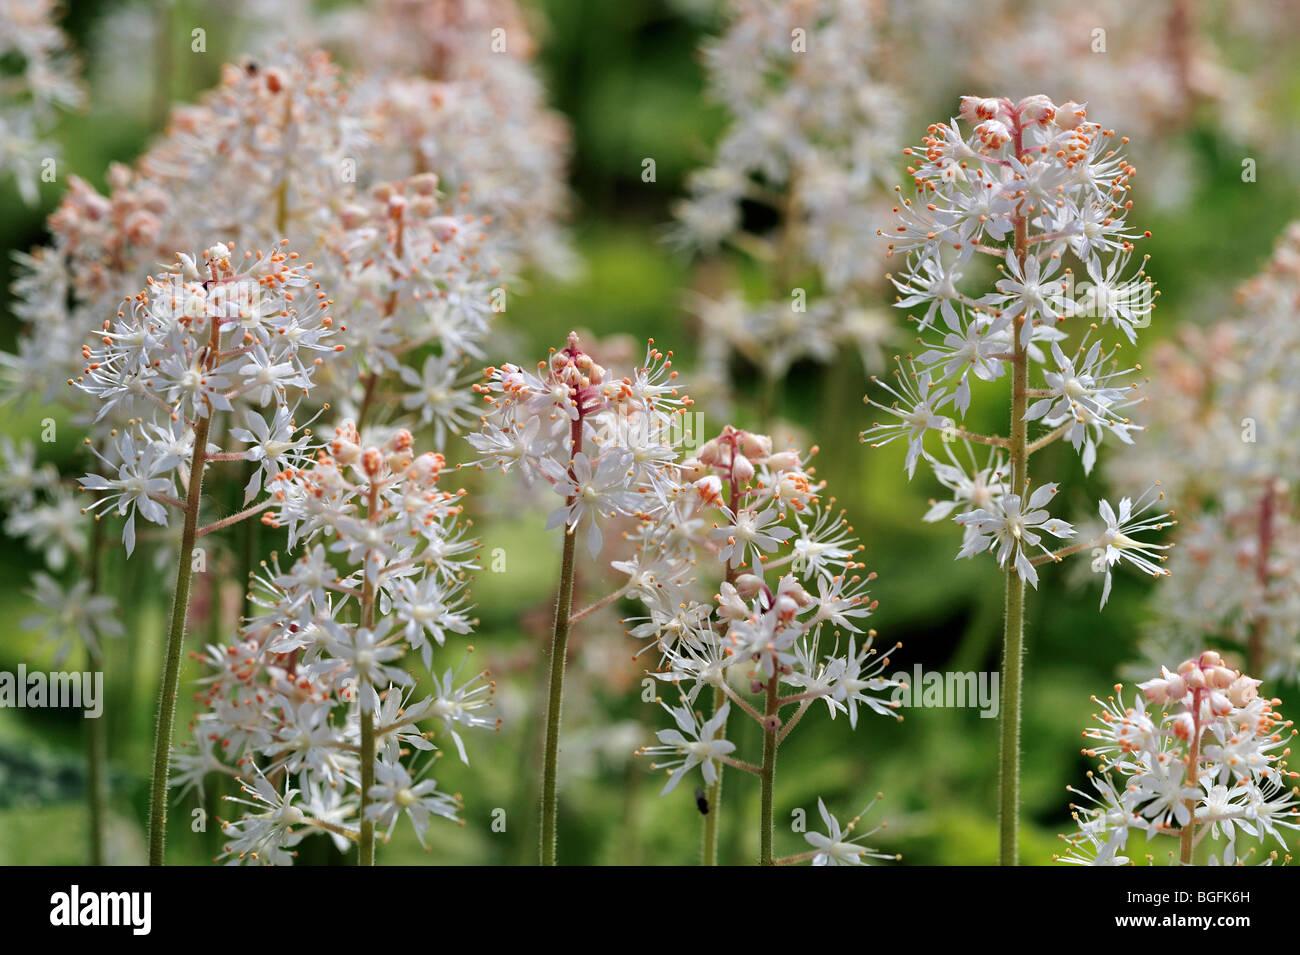 Heartleaved Foamflower / Allegheny Foam flower (Tiarella cordifolia), native to North America, US - Stock Image